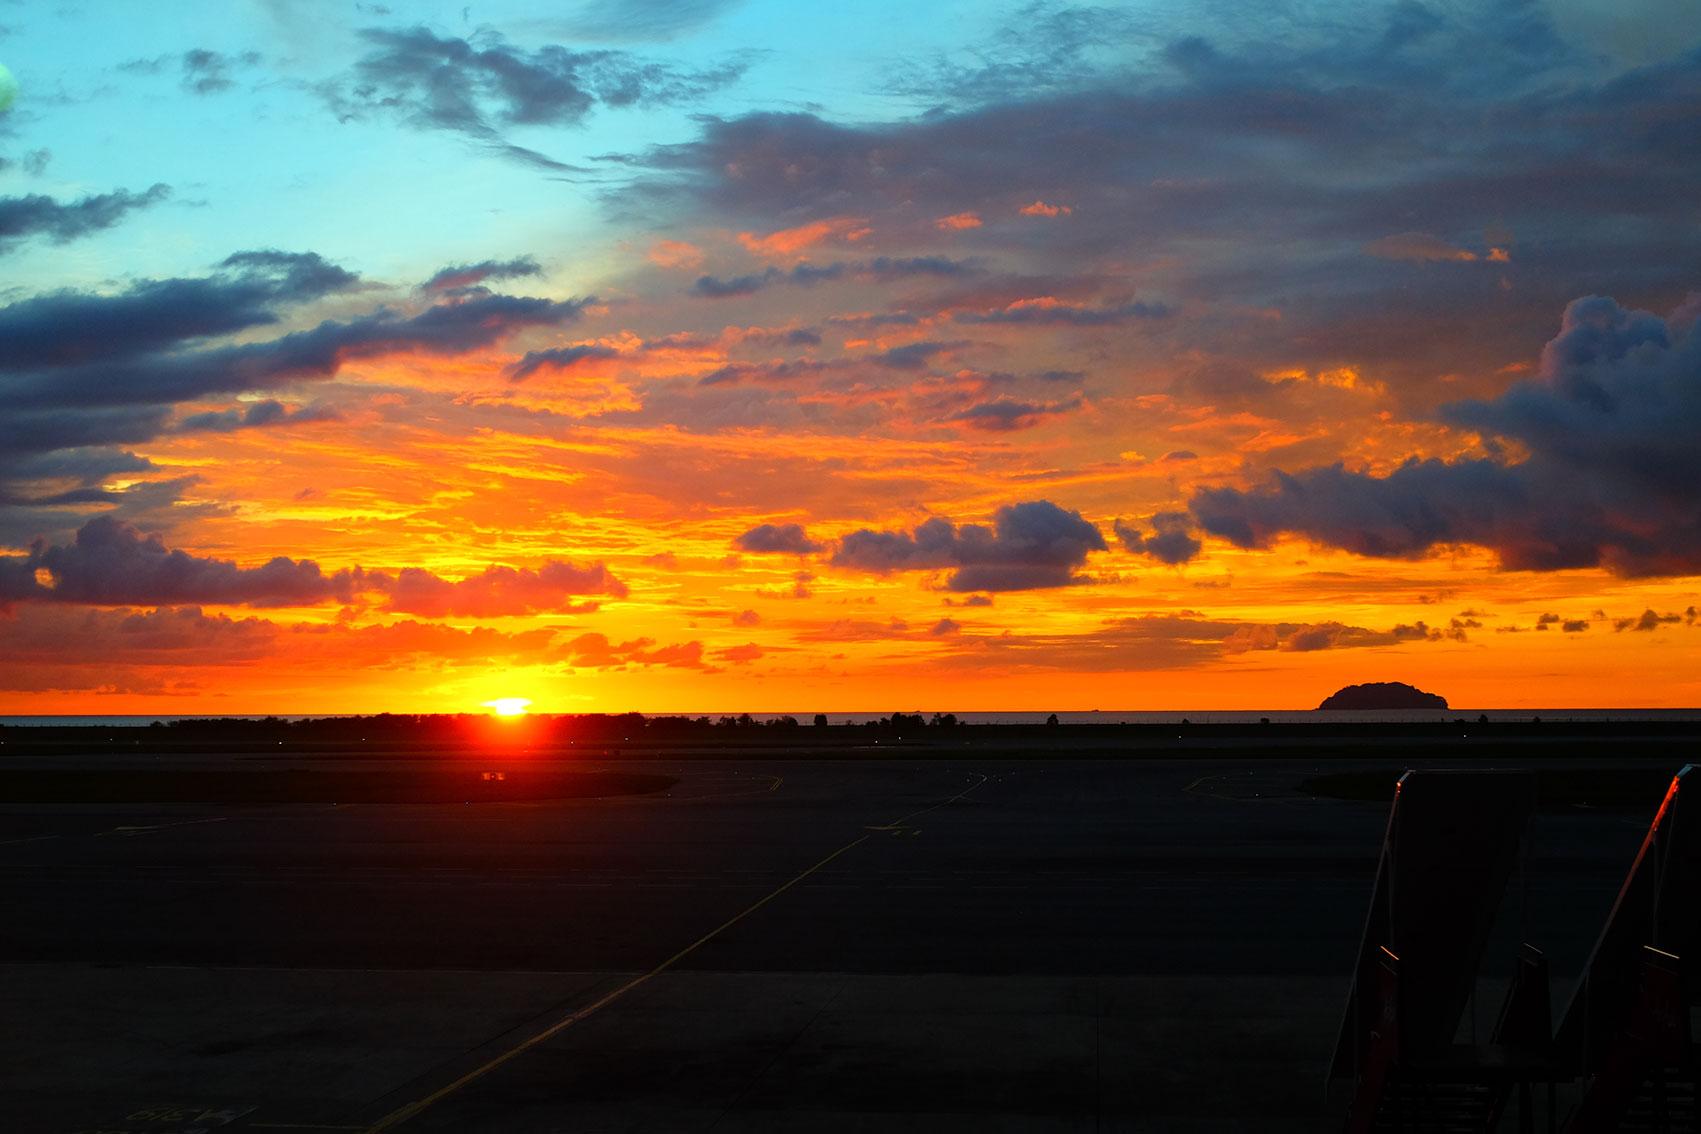 Kota Kinabalu airport sunset